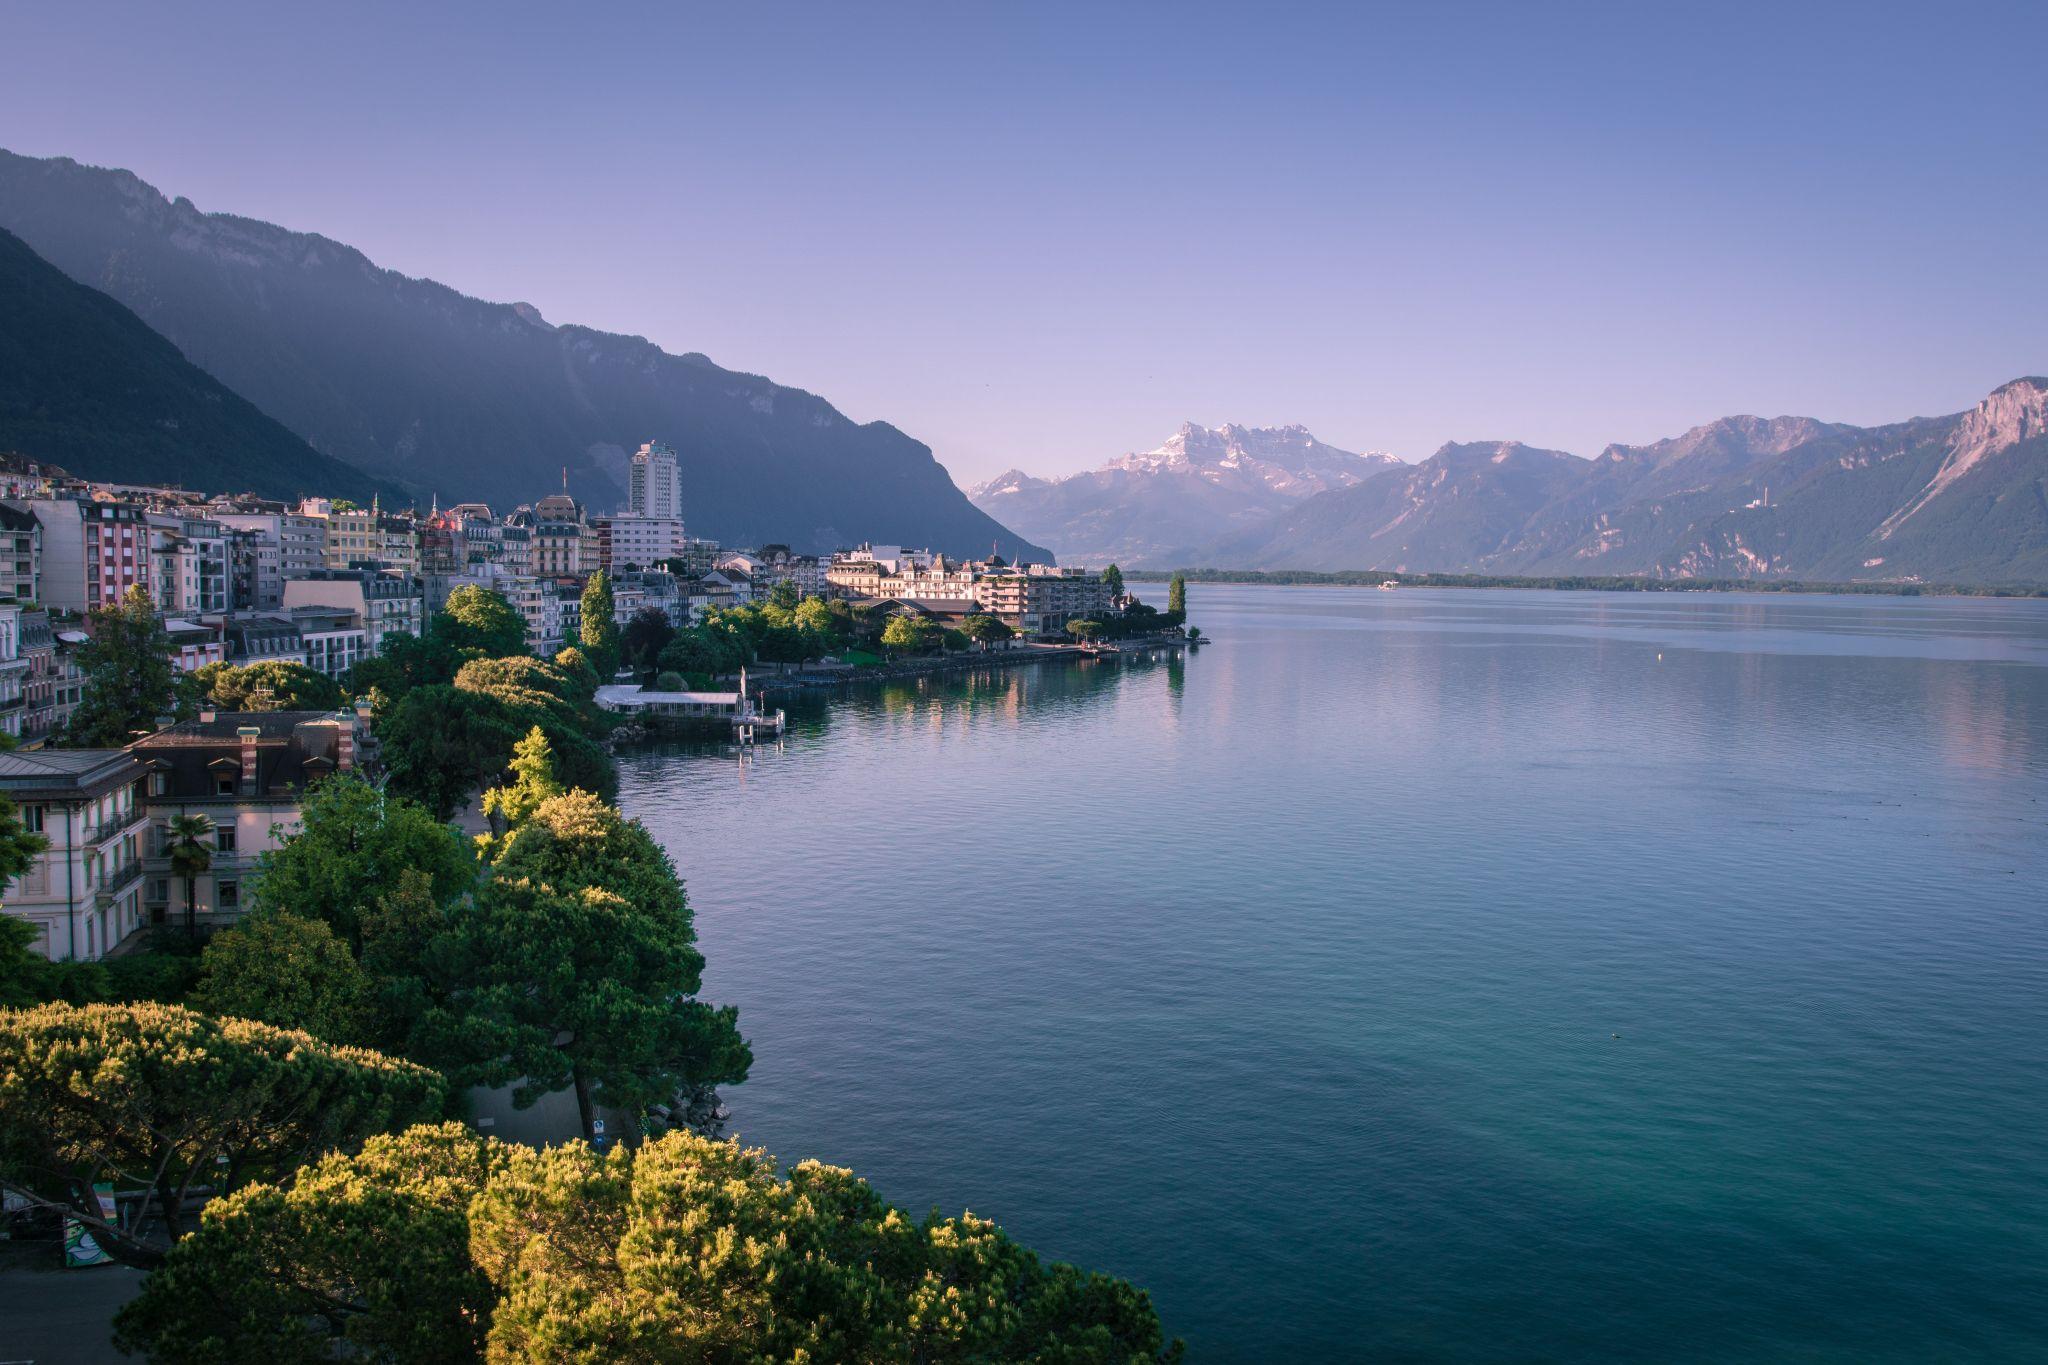 Quai Edouard Jaccoud, Switzerland